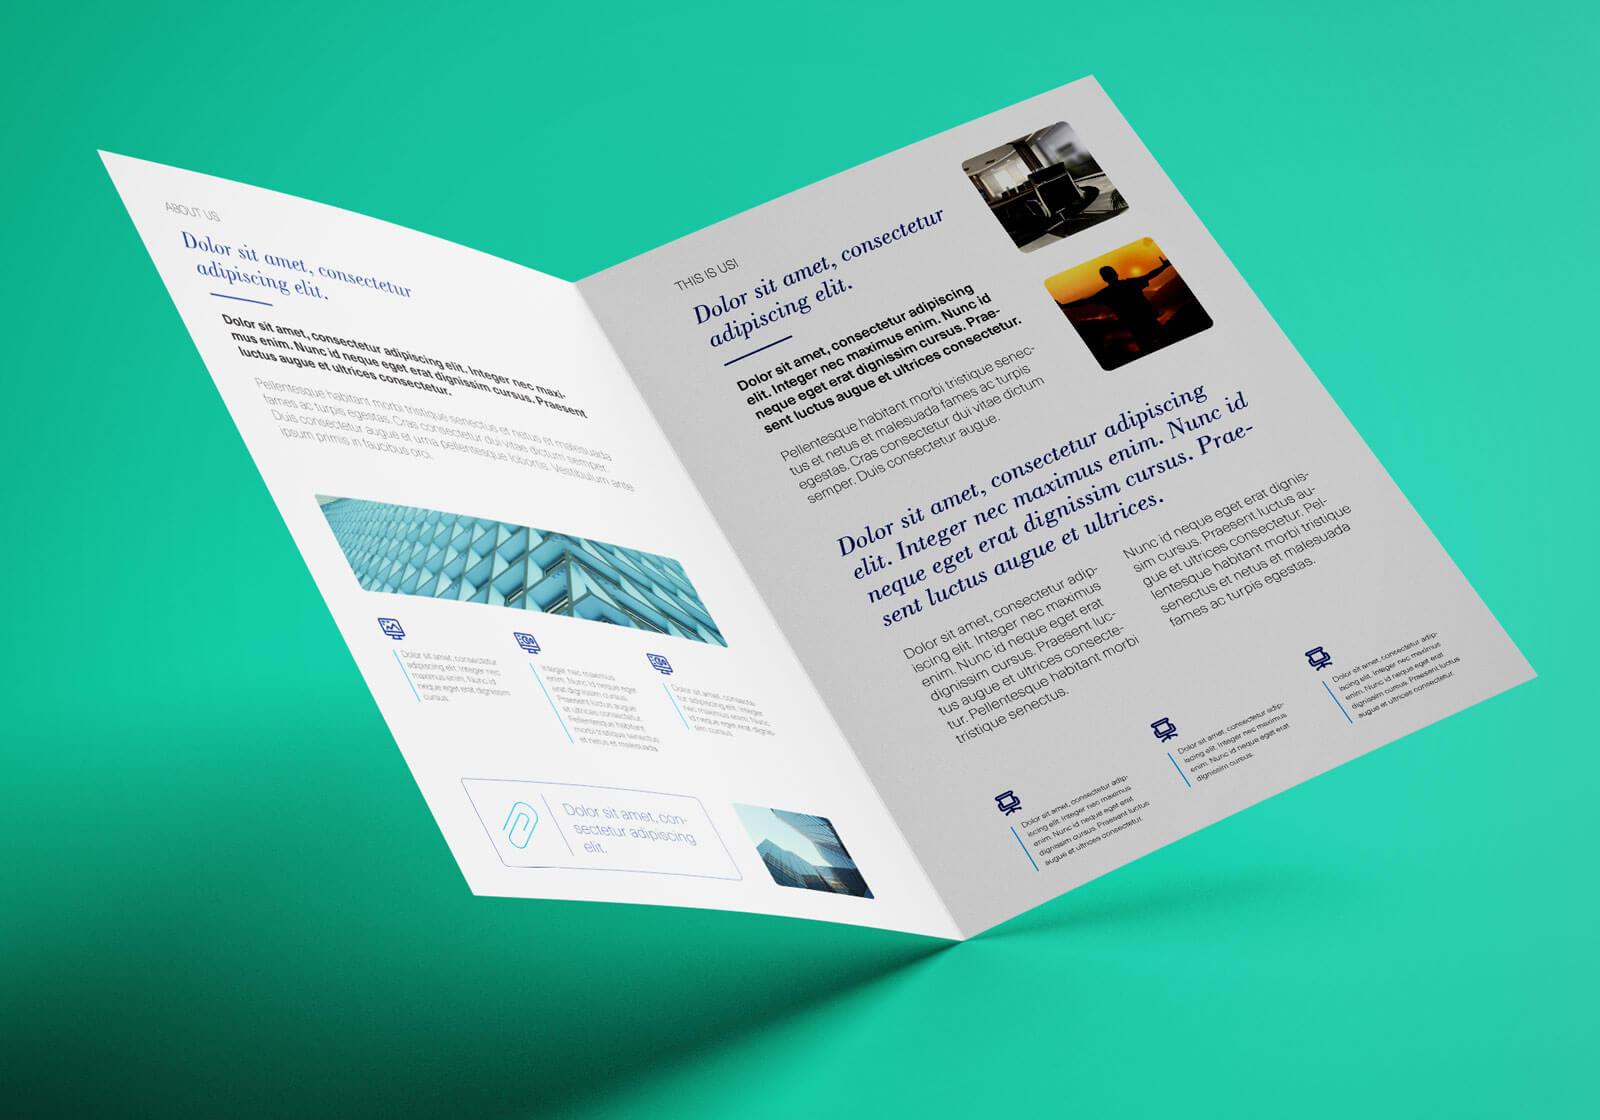 Free Bi Fold A4 Brochure Mockup Psd - Good Mockups With Regard To 2 Fold Brochure Template Psd